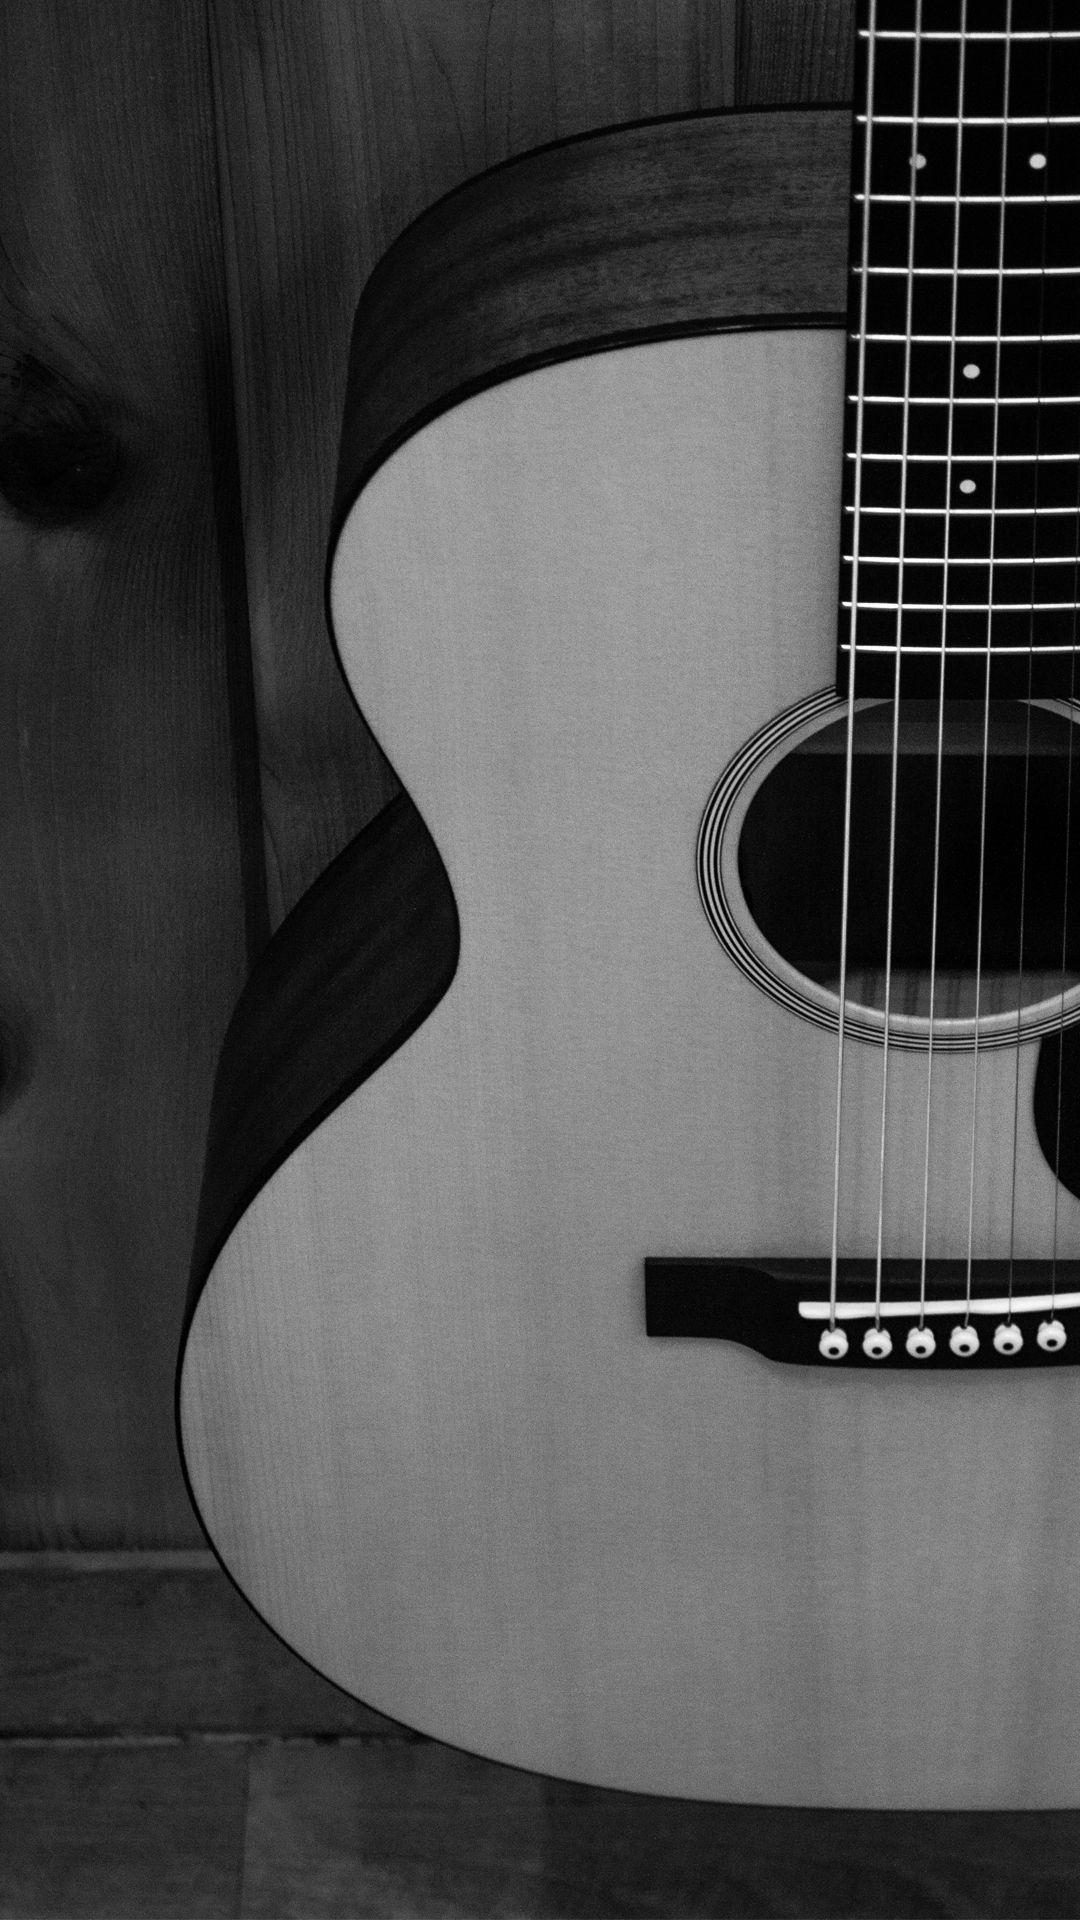 Http Www Vactualpapers Com Gallery Guitar Closeup Hd Mobile